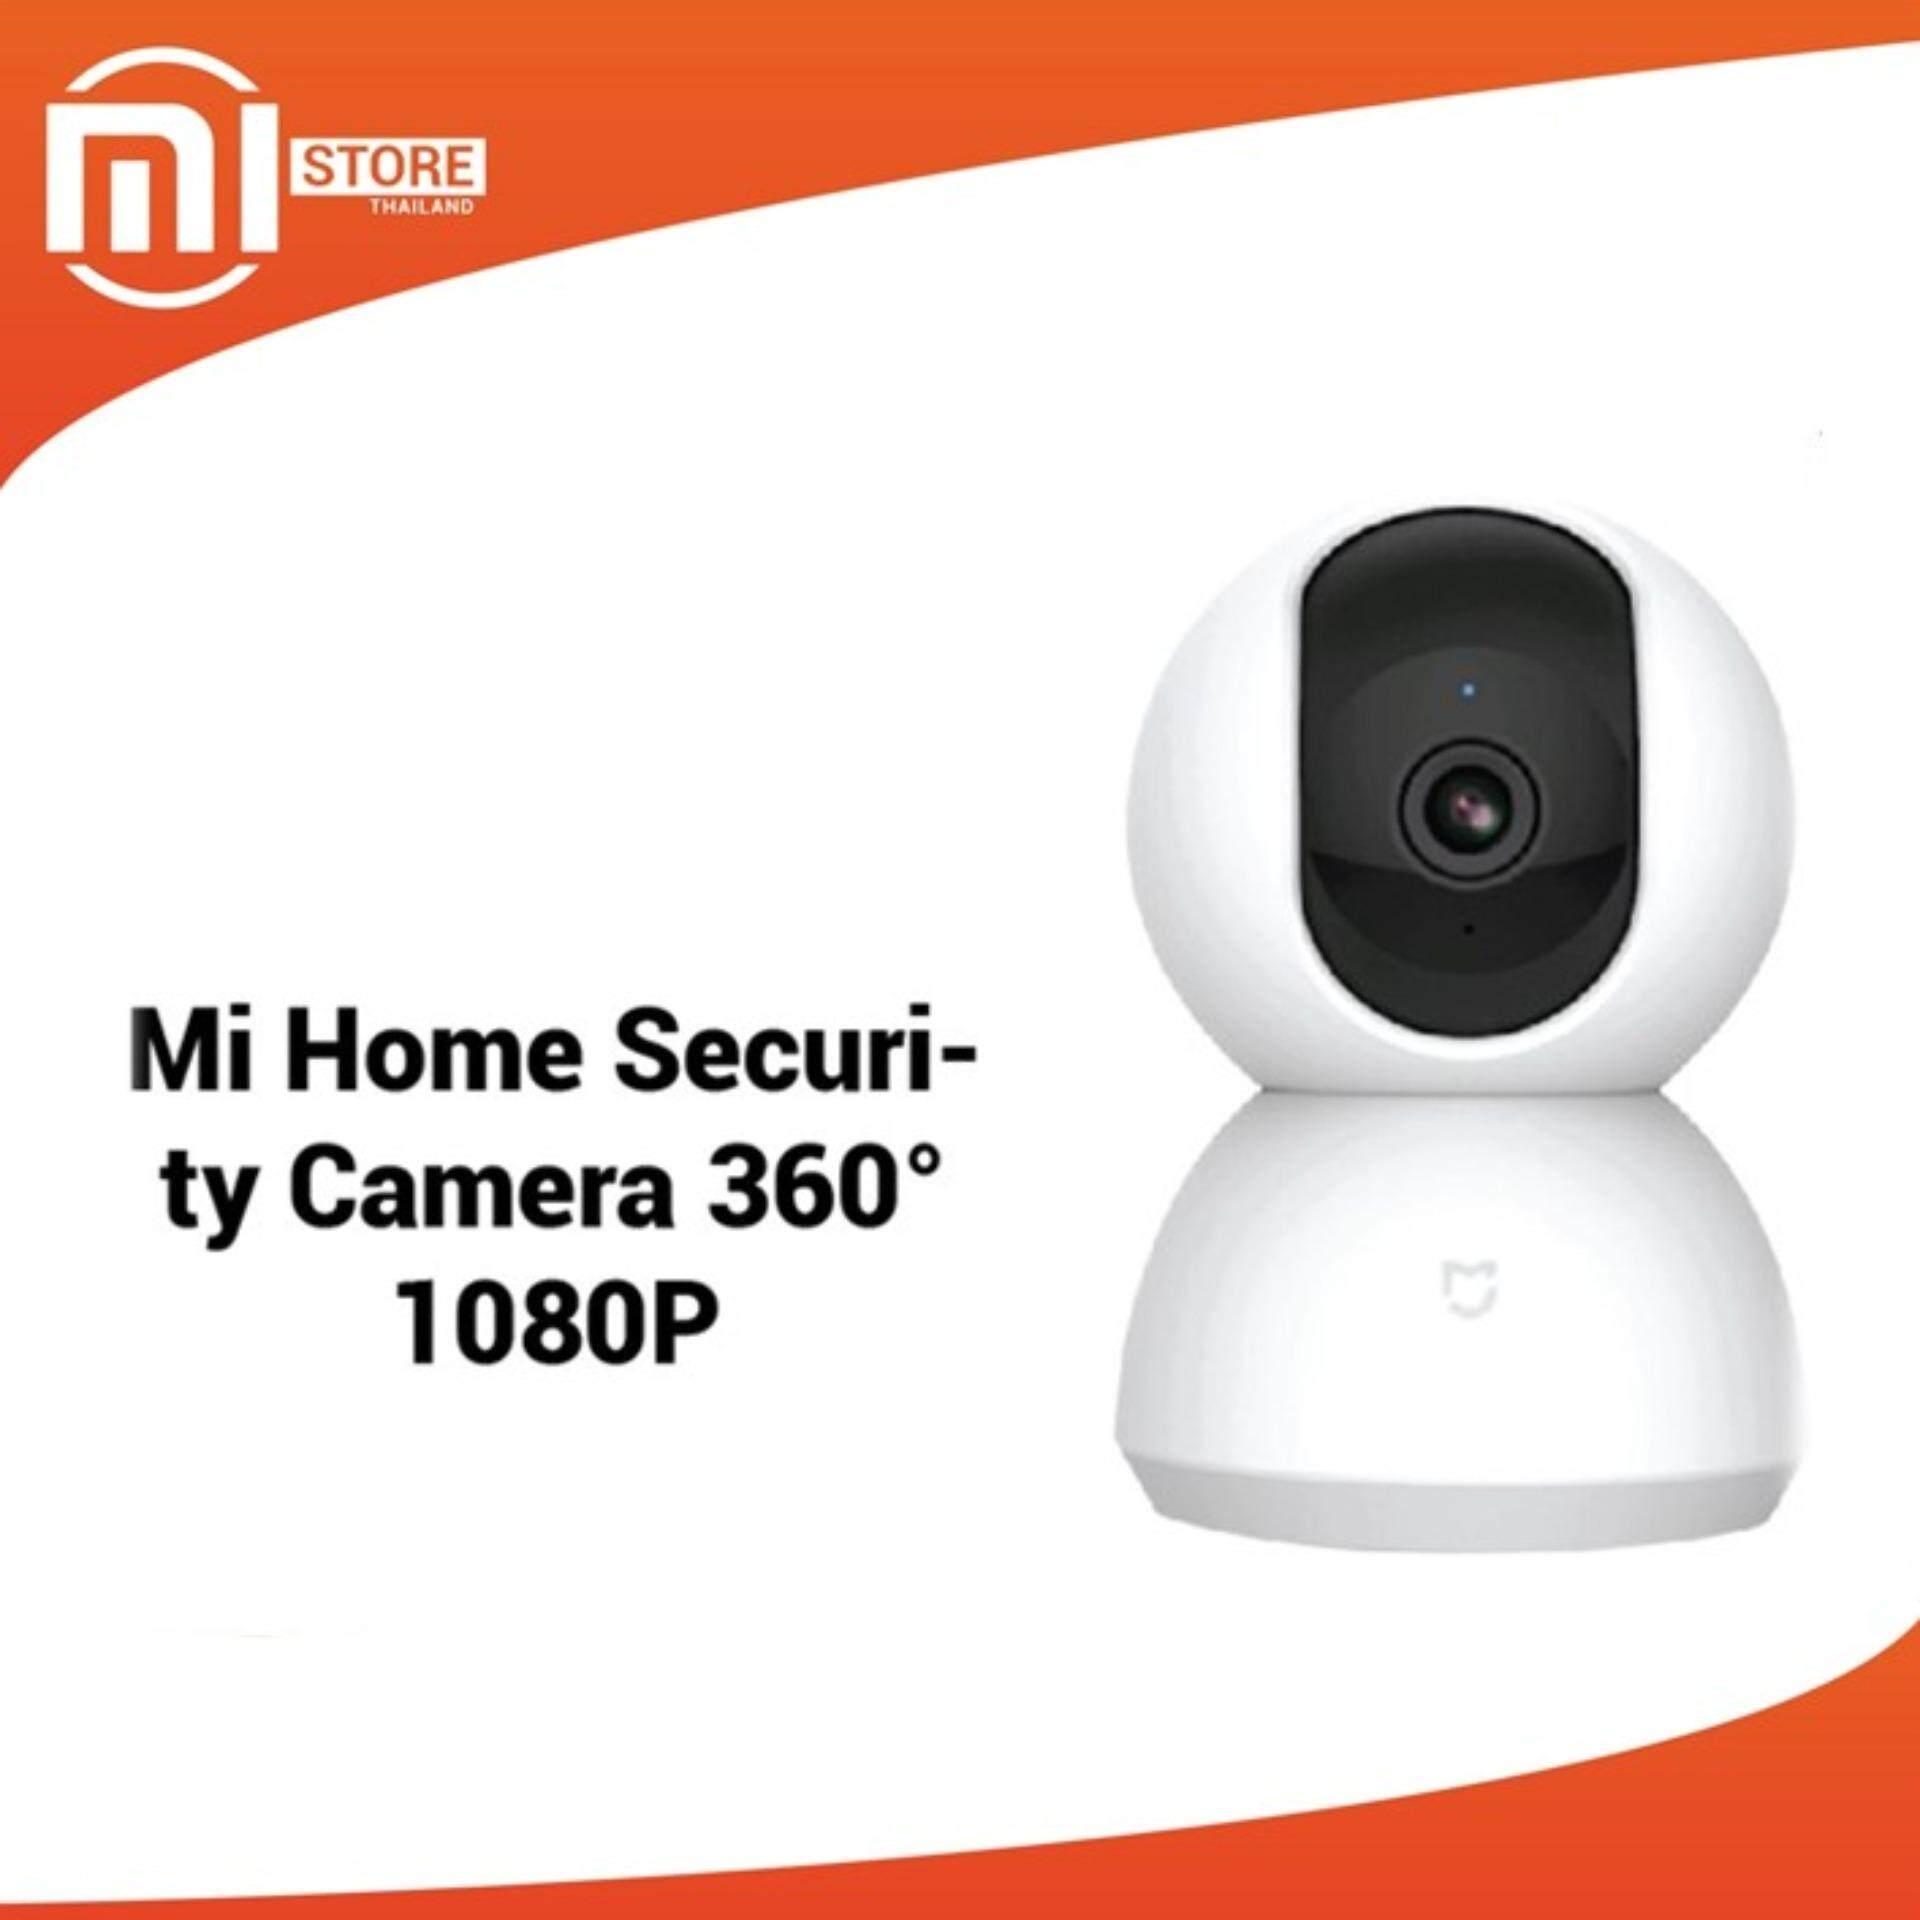 Mi Store - Mi Home Security Camera 360° กล้องวงจรปิด Xiaomi Mi Home Security Camera ของแท้จากเสี่ยวหมี่ มาพร้อมความละเอียด 1080p Full Hd, 20fp เลนส์มุมกว้างถรุ่น 1080p *ไม่มีอะเด๊ปเตอร์ *รับประกันศูนย์ 1 ปี การันตีพบปัญหาเปลี่ยนสินค้าใหม่ภายใน 15วันทันที By Mi Store Thailand.